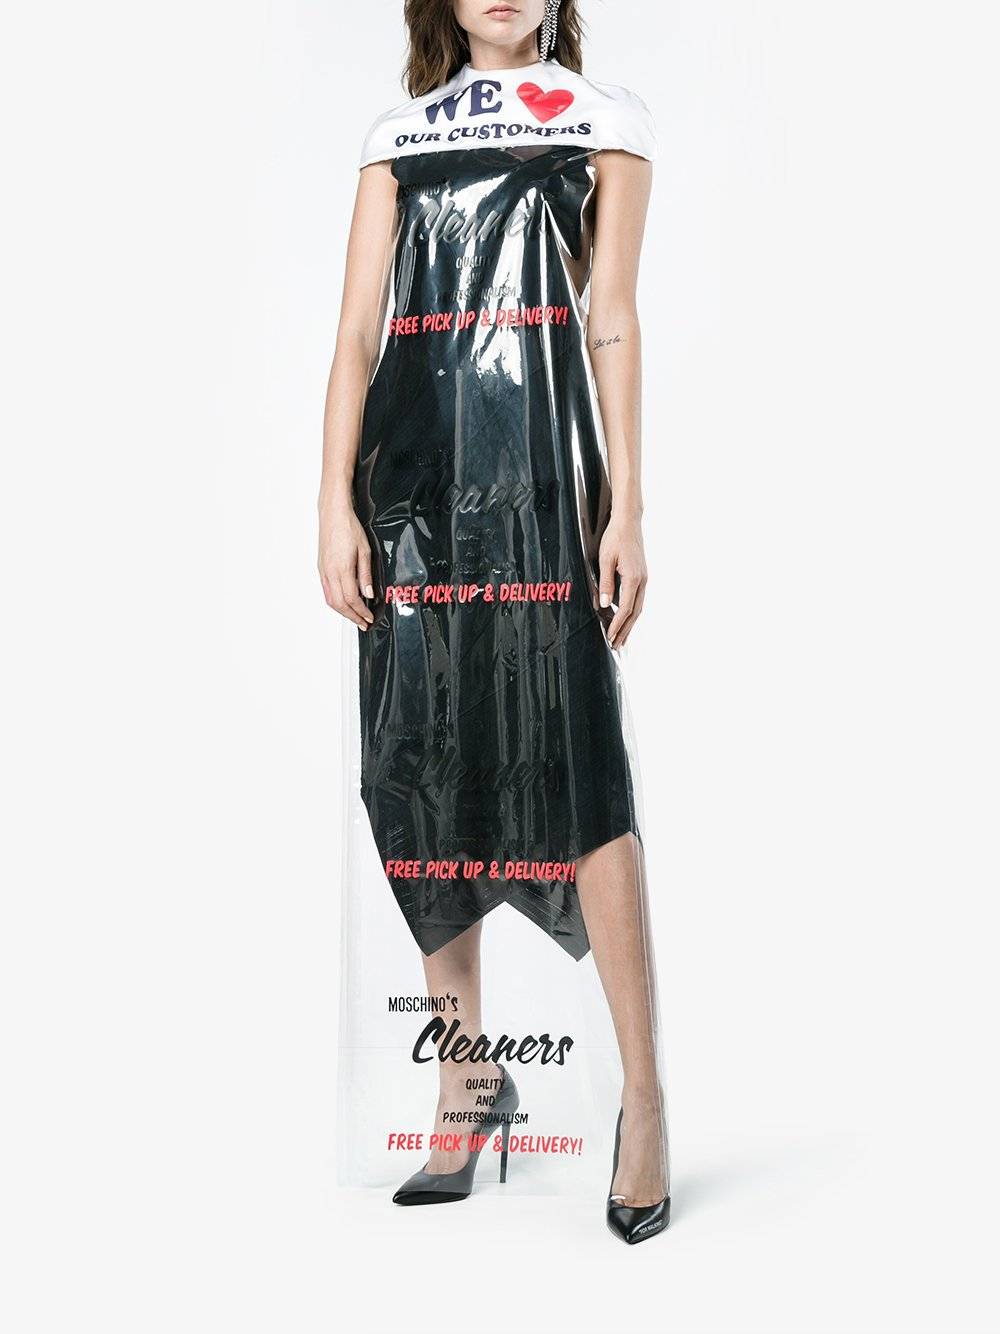 Moschino-vestido-bolsa de plastico-Brown-02